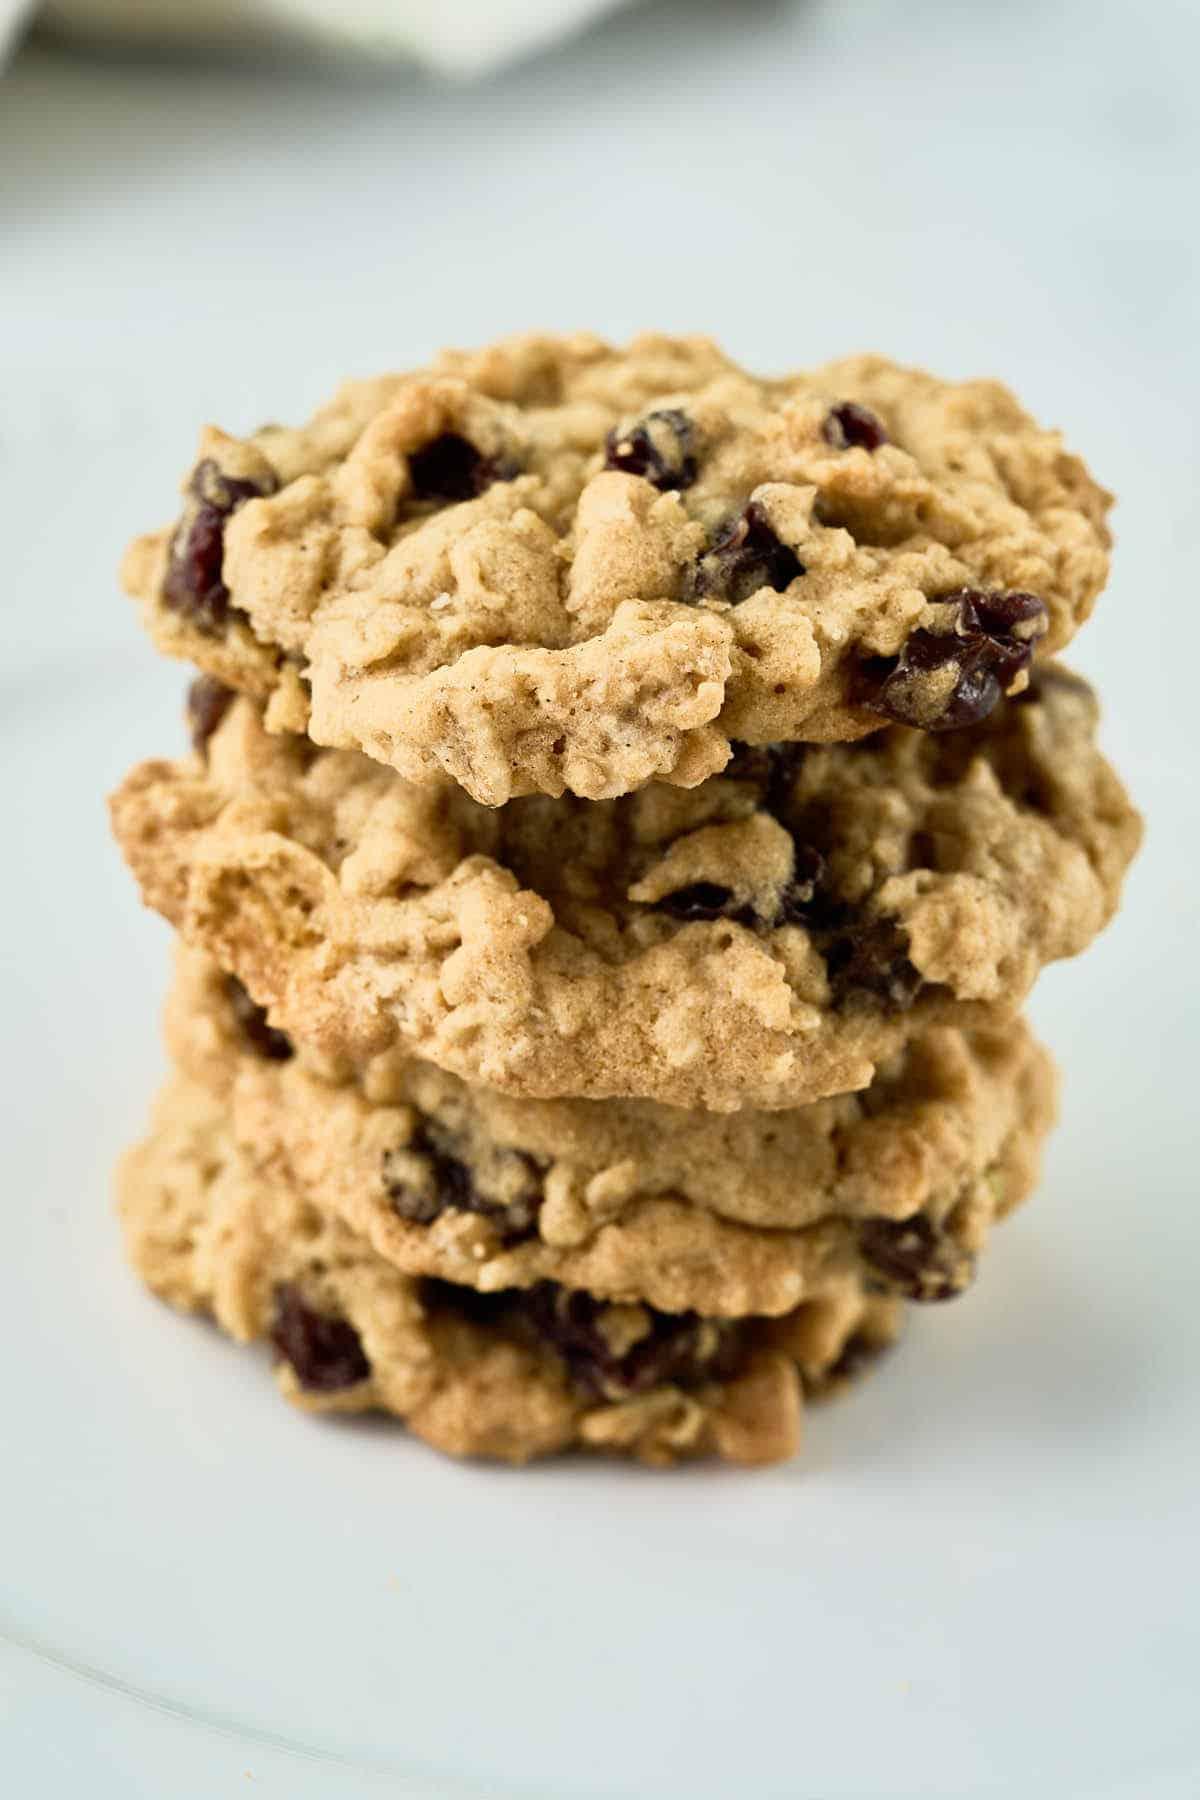 stack of 4 oatmeal raisin cookies